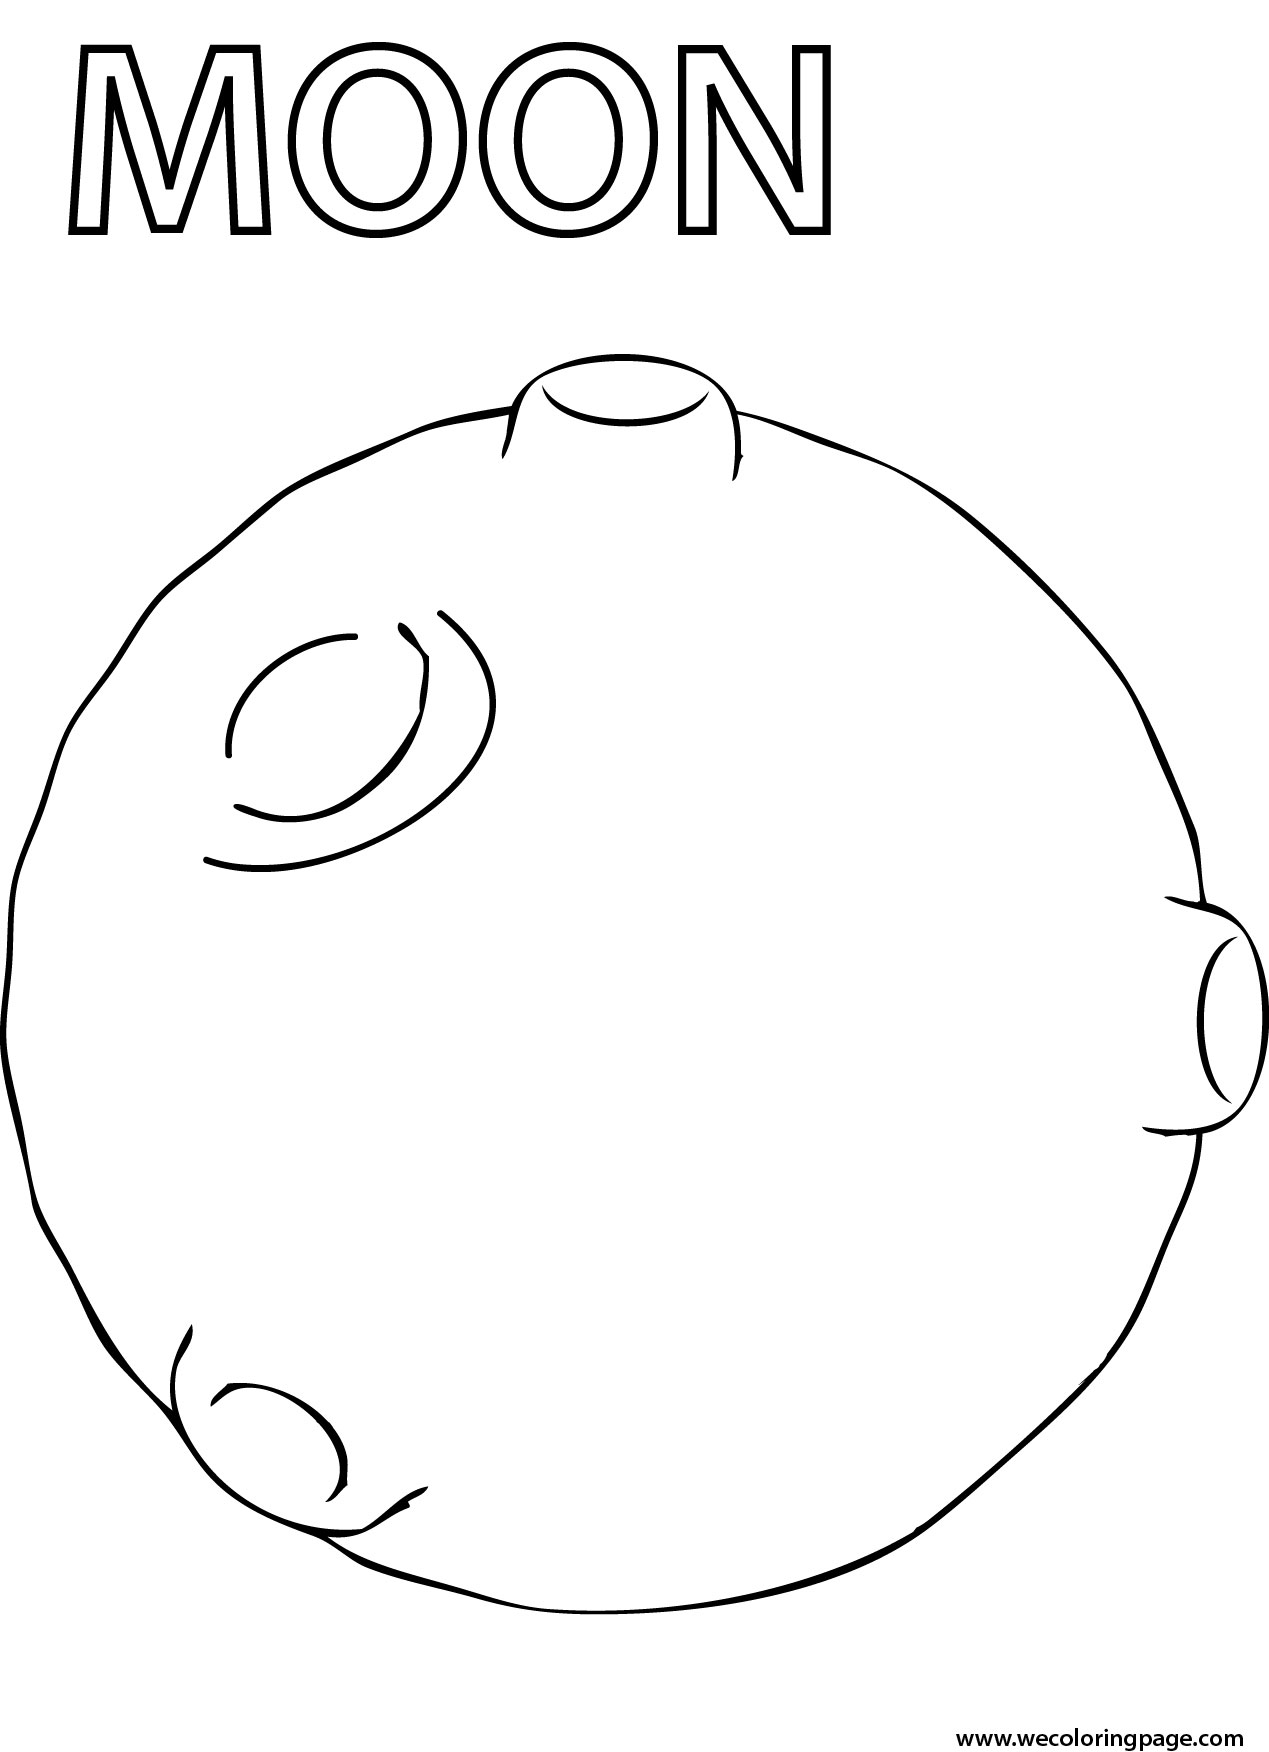 Moon coloring #10, Download drawings